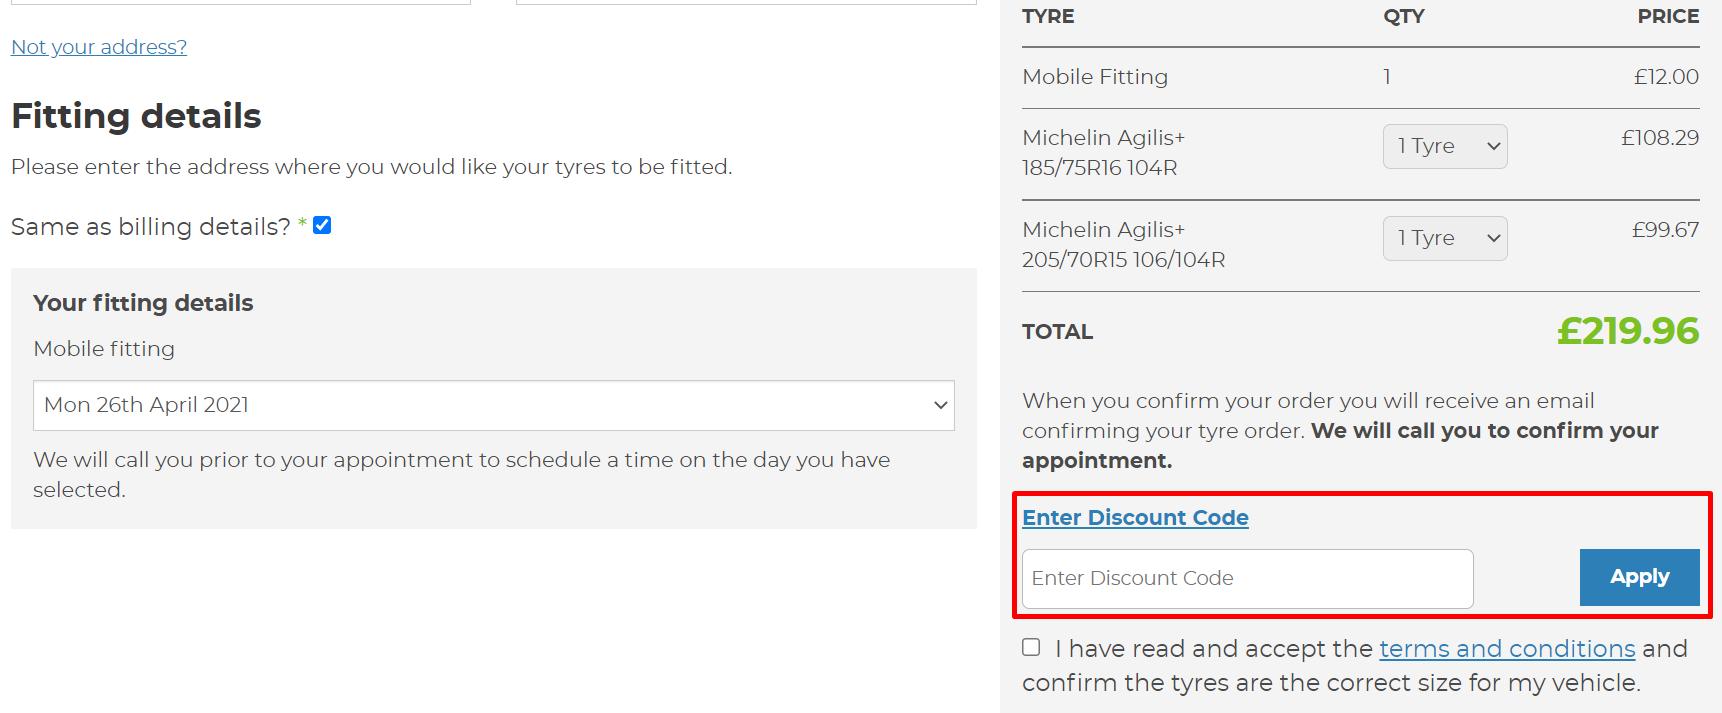 How do I use my Asda Tyres discount code?